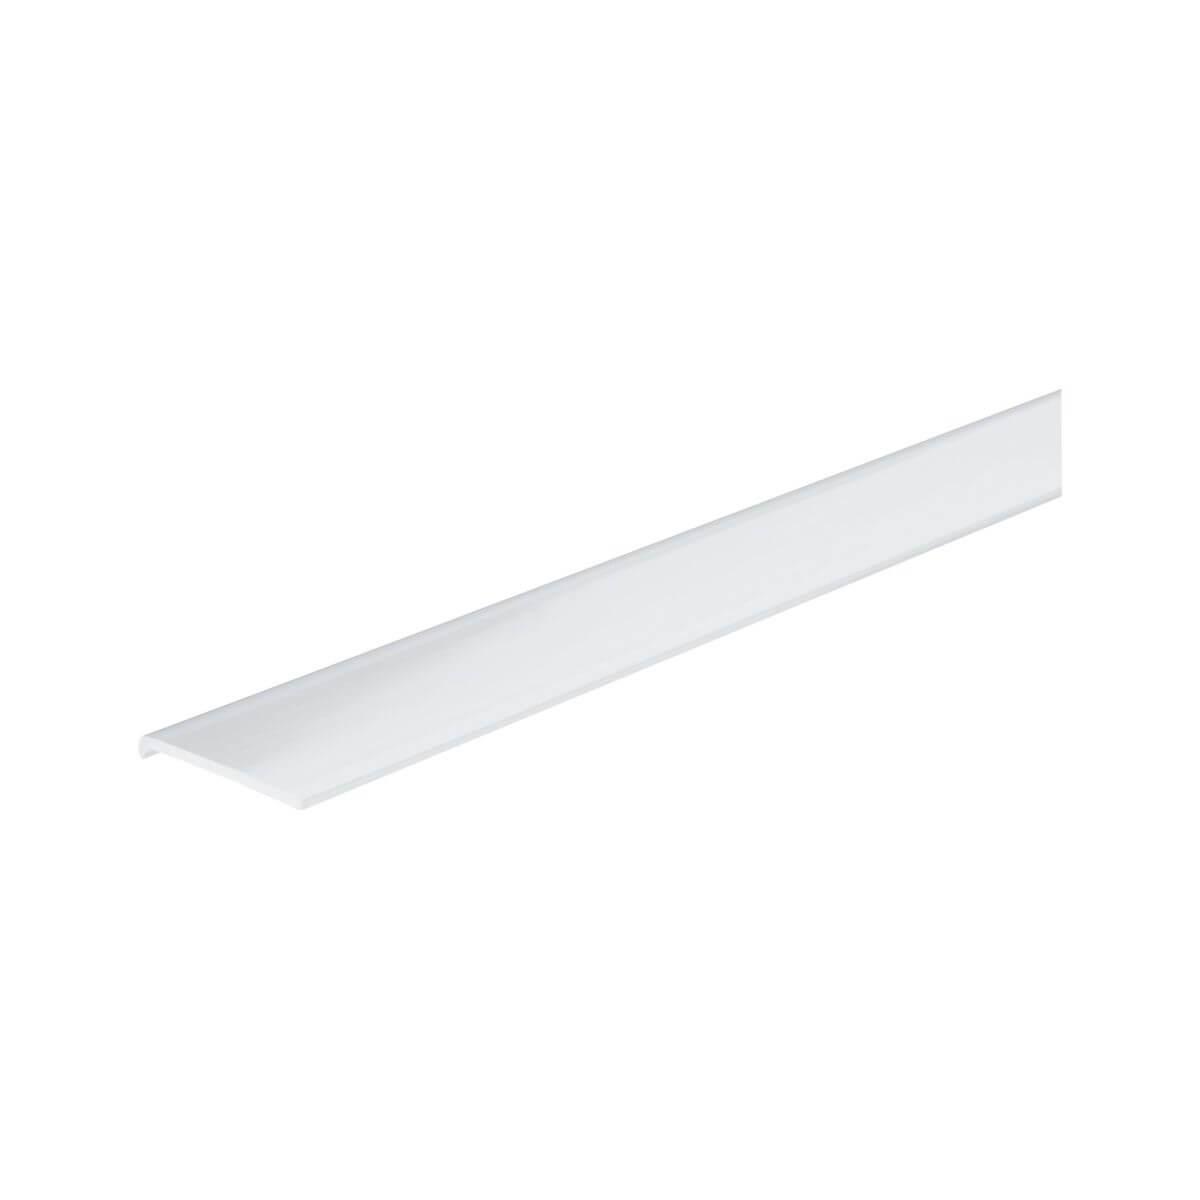 PaulmannDuo Kunststoff Profil Diffusor 2mSatin